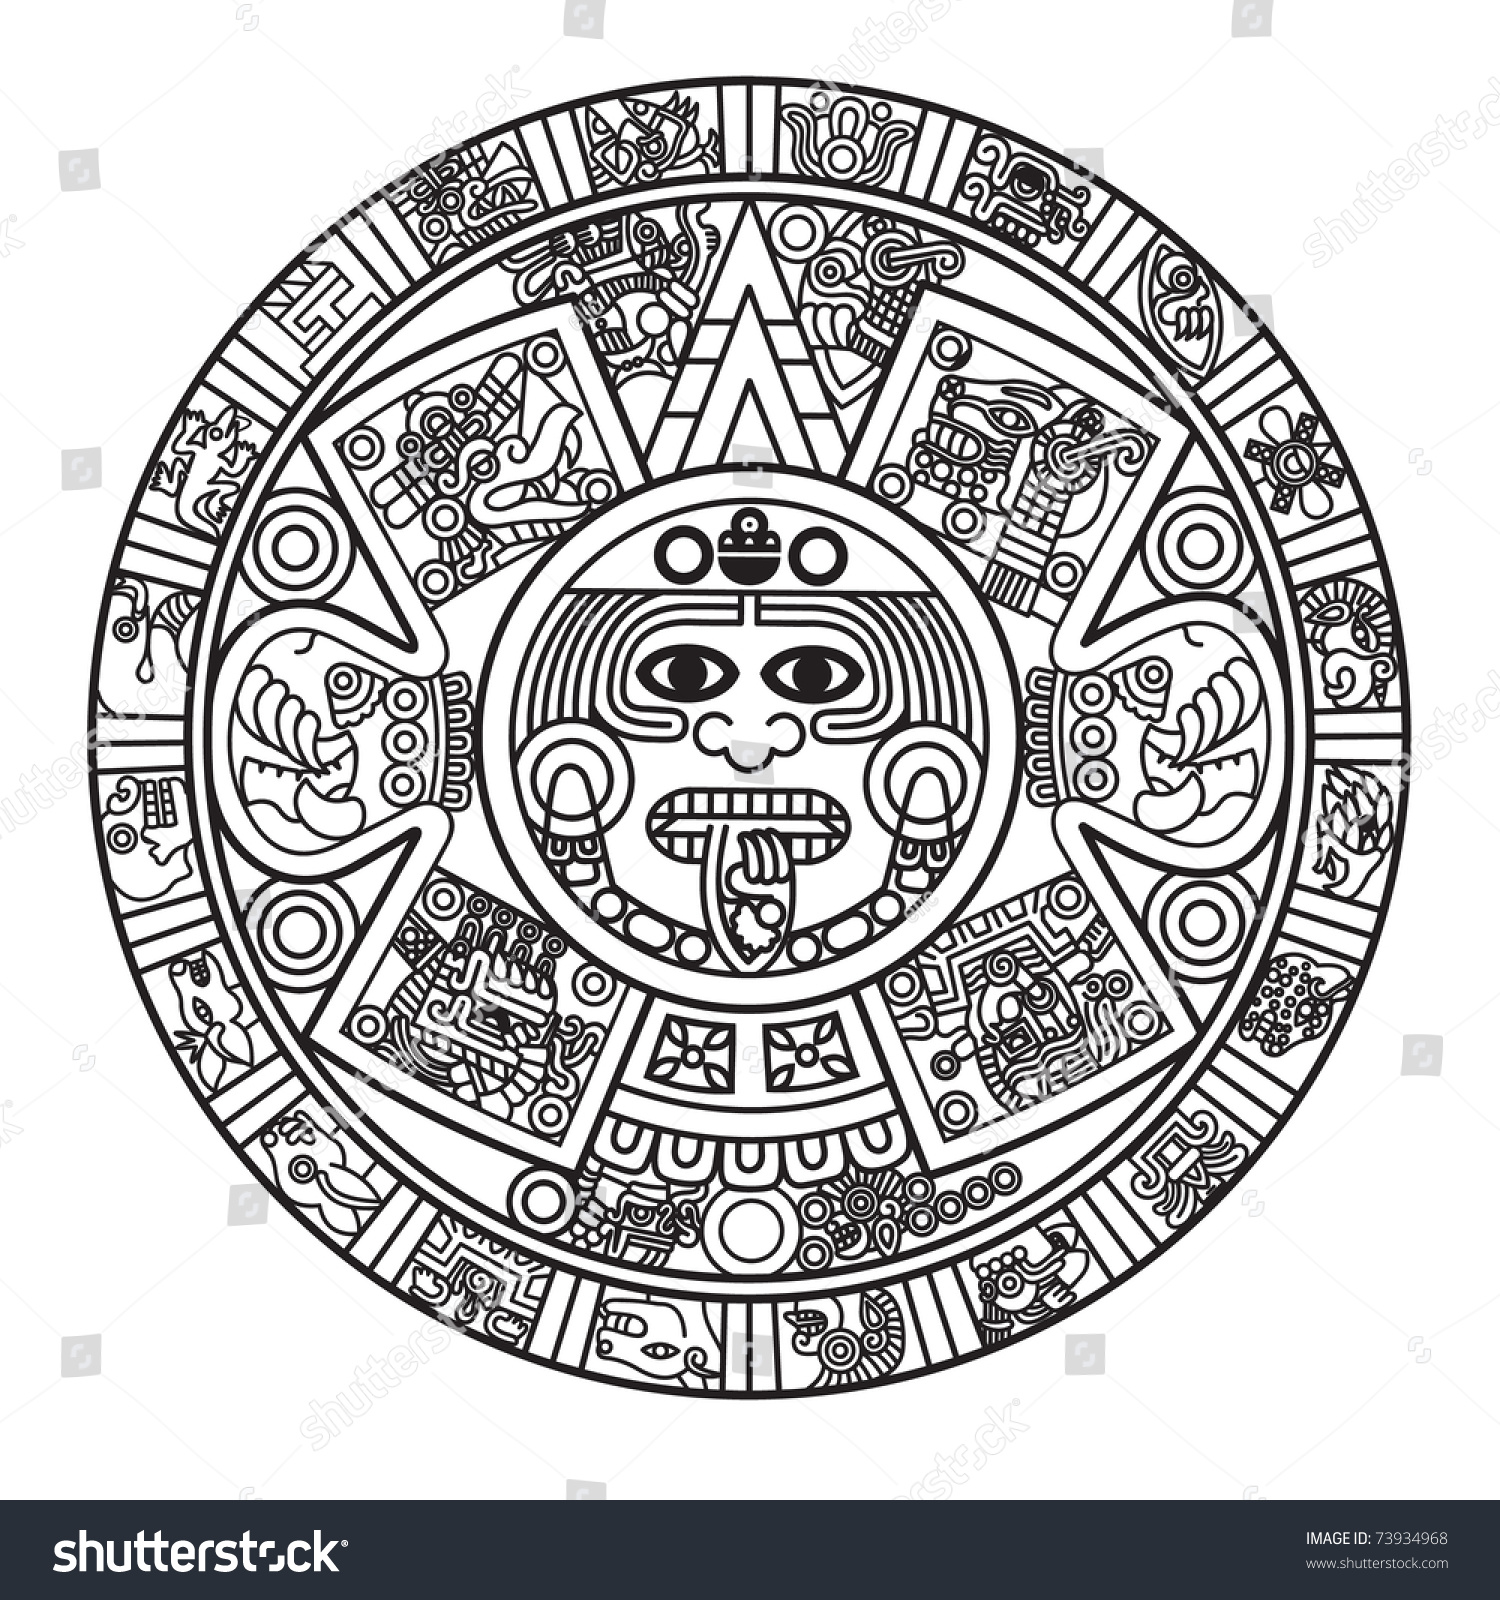 Simple Mayan Calendar Drawing : Mayan calendar clip art cliparts